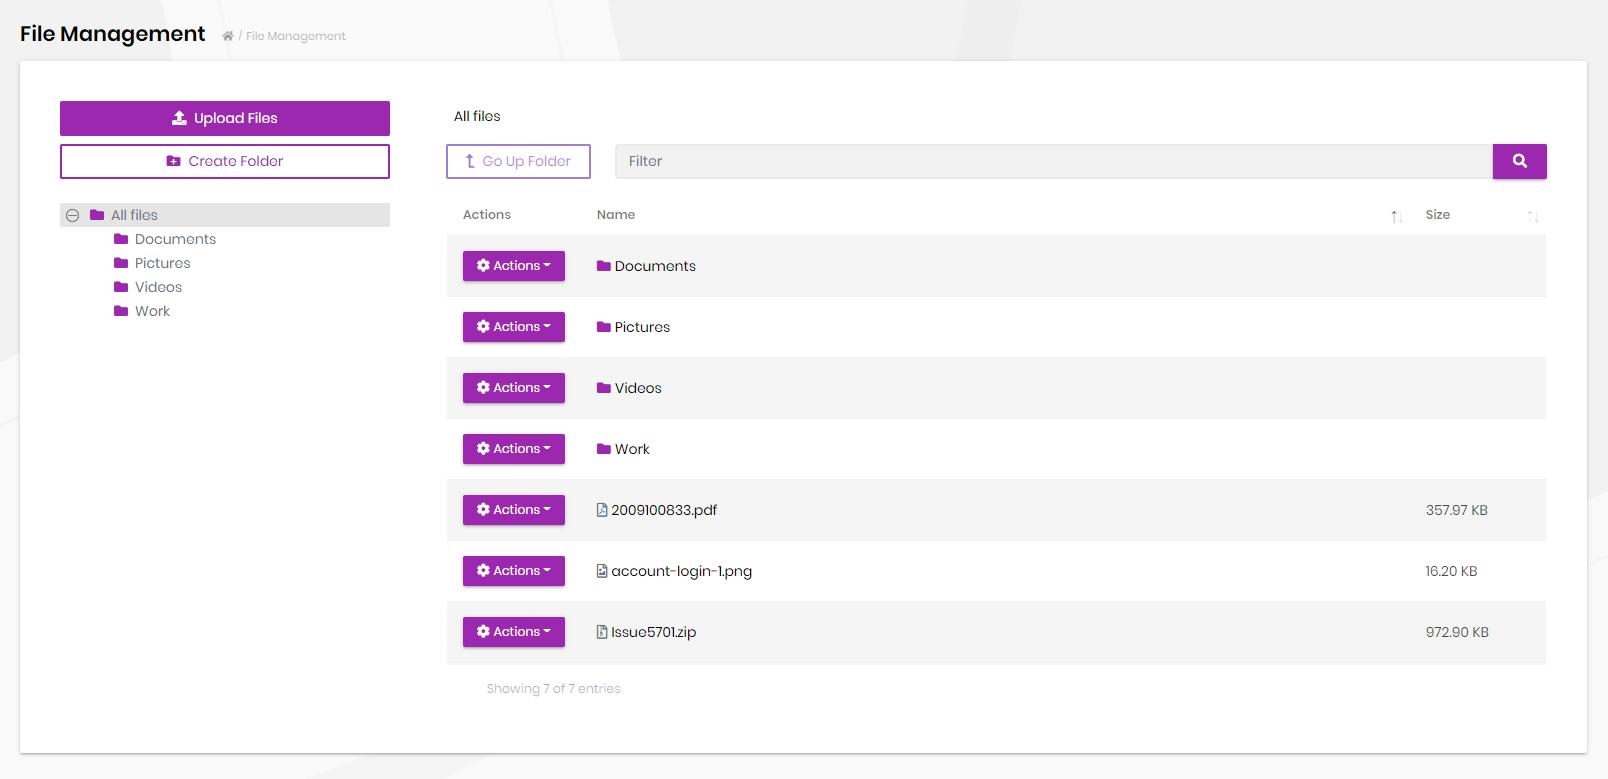 file-management-index-page